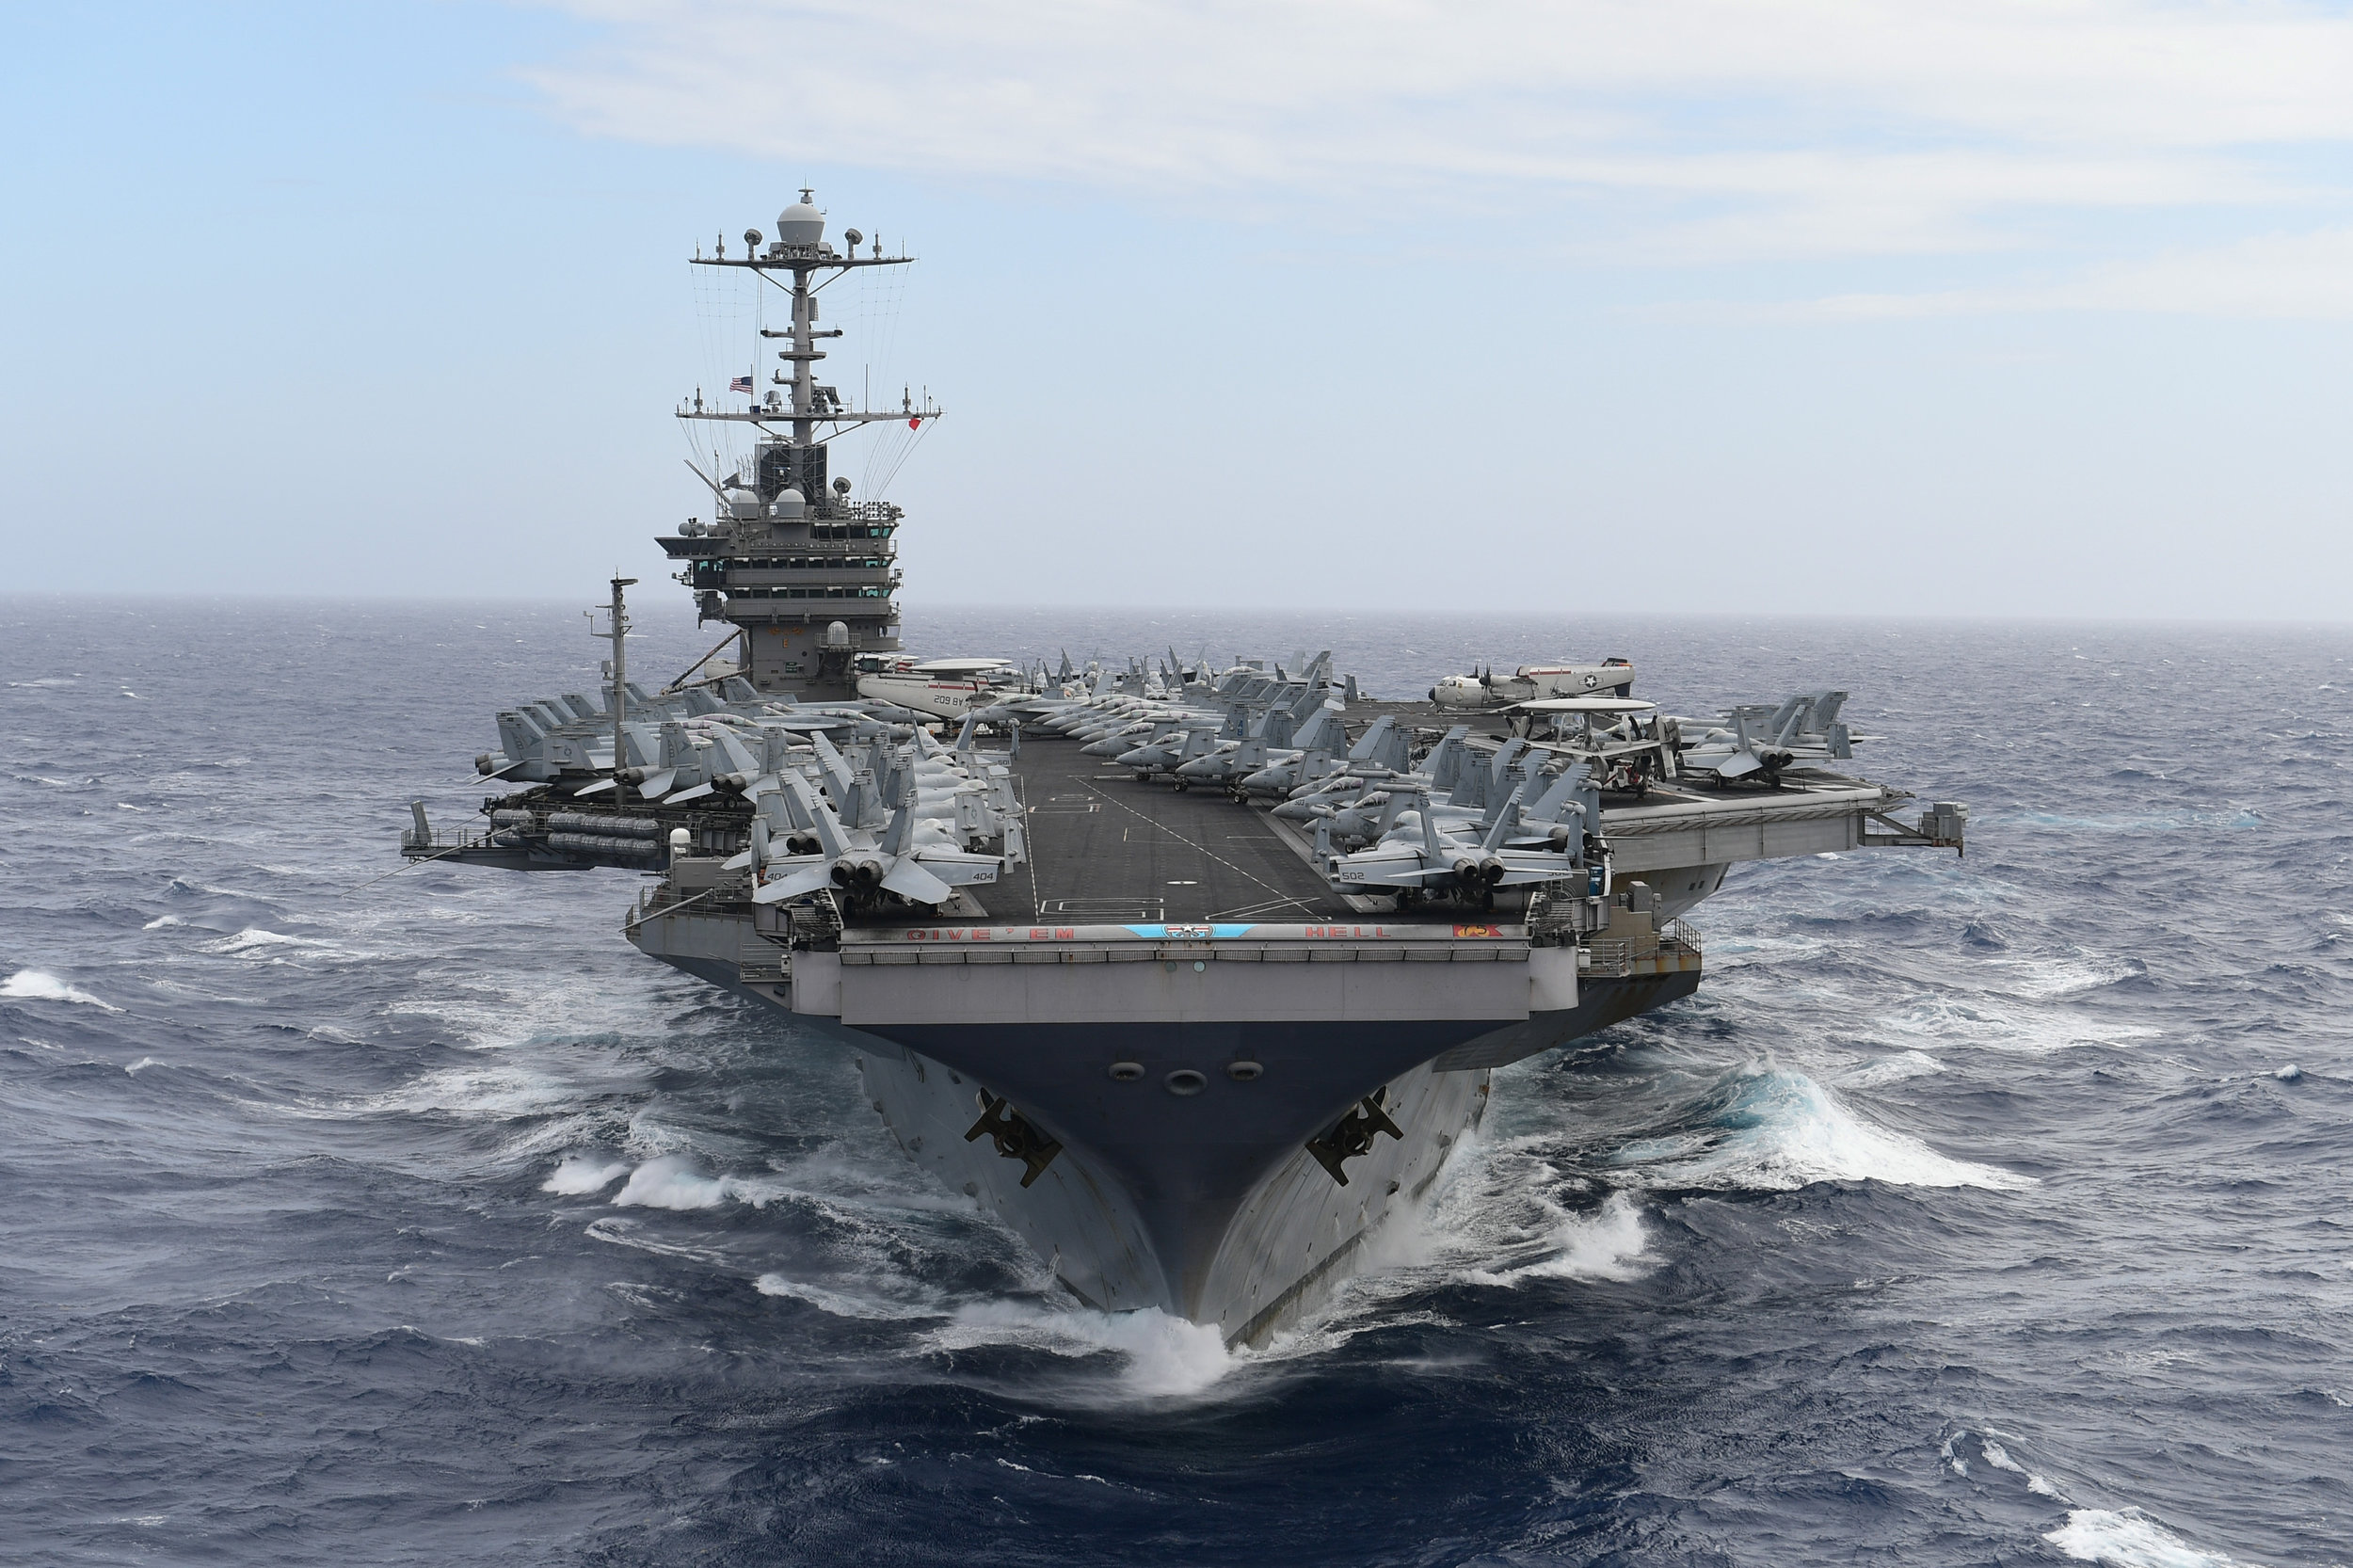 The Nimitz-class aircraft carrier USS Harry S. Truman (CVN 75) transits the Atlantic Ocean, Dec. 12, 2018.jpg